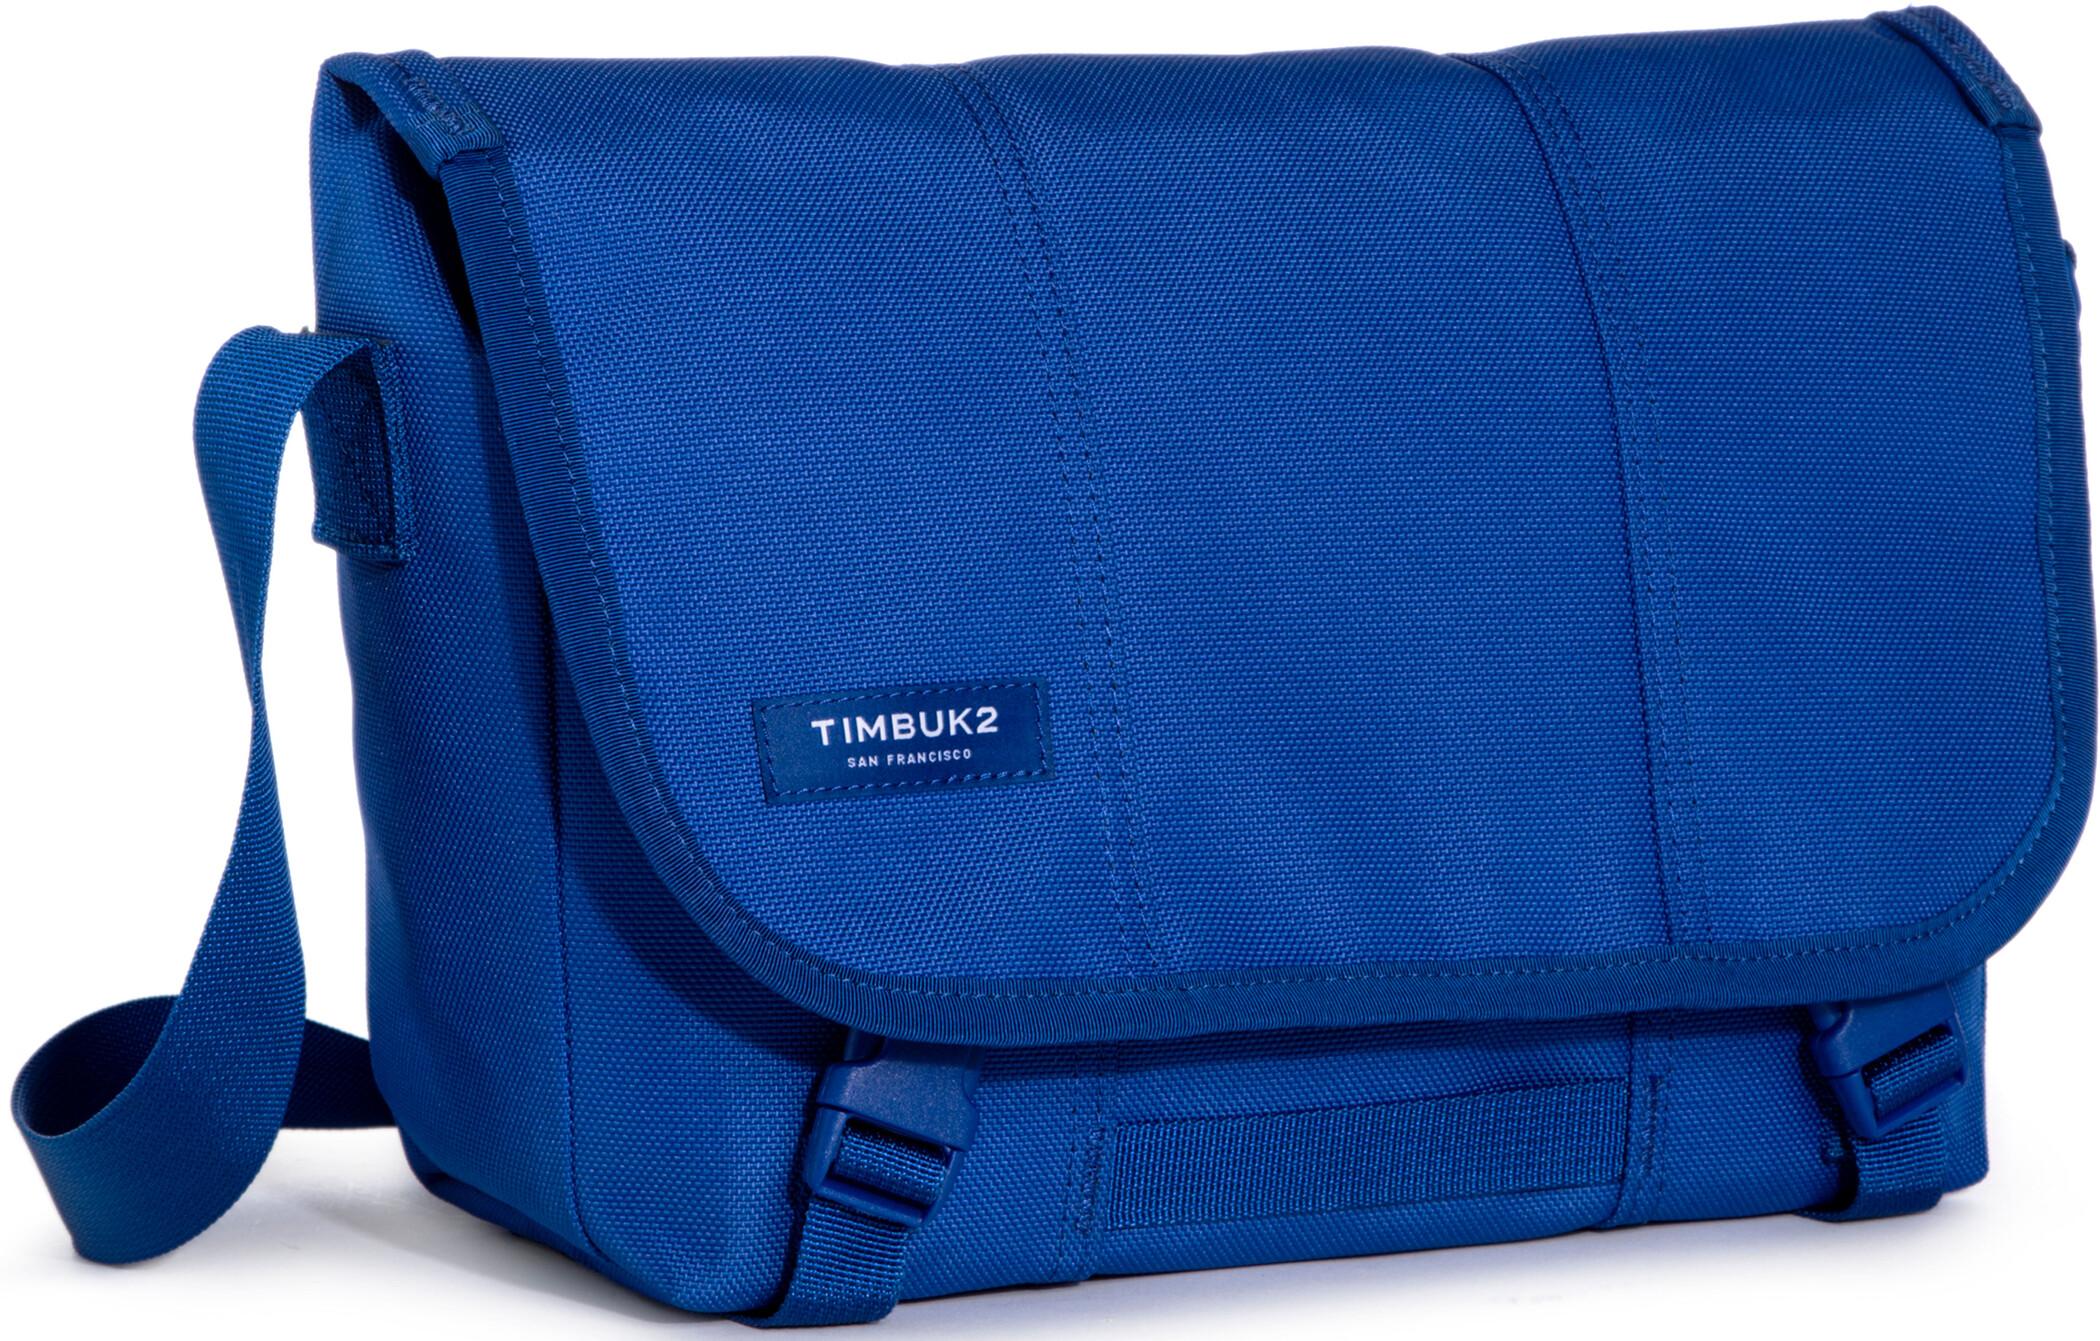 Timbuk2 Classic Taske XS, intensity (2019) | Travel bags